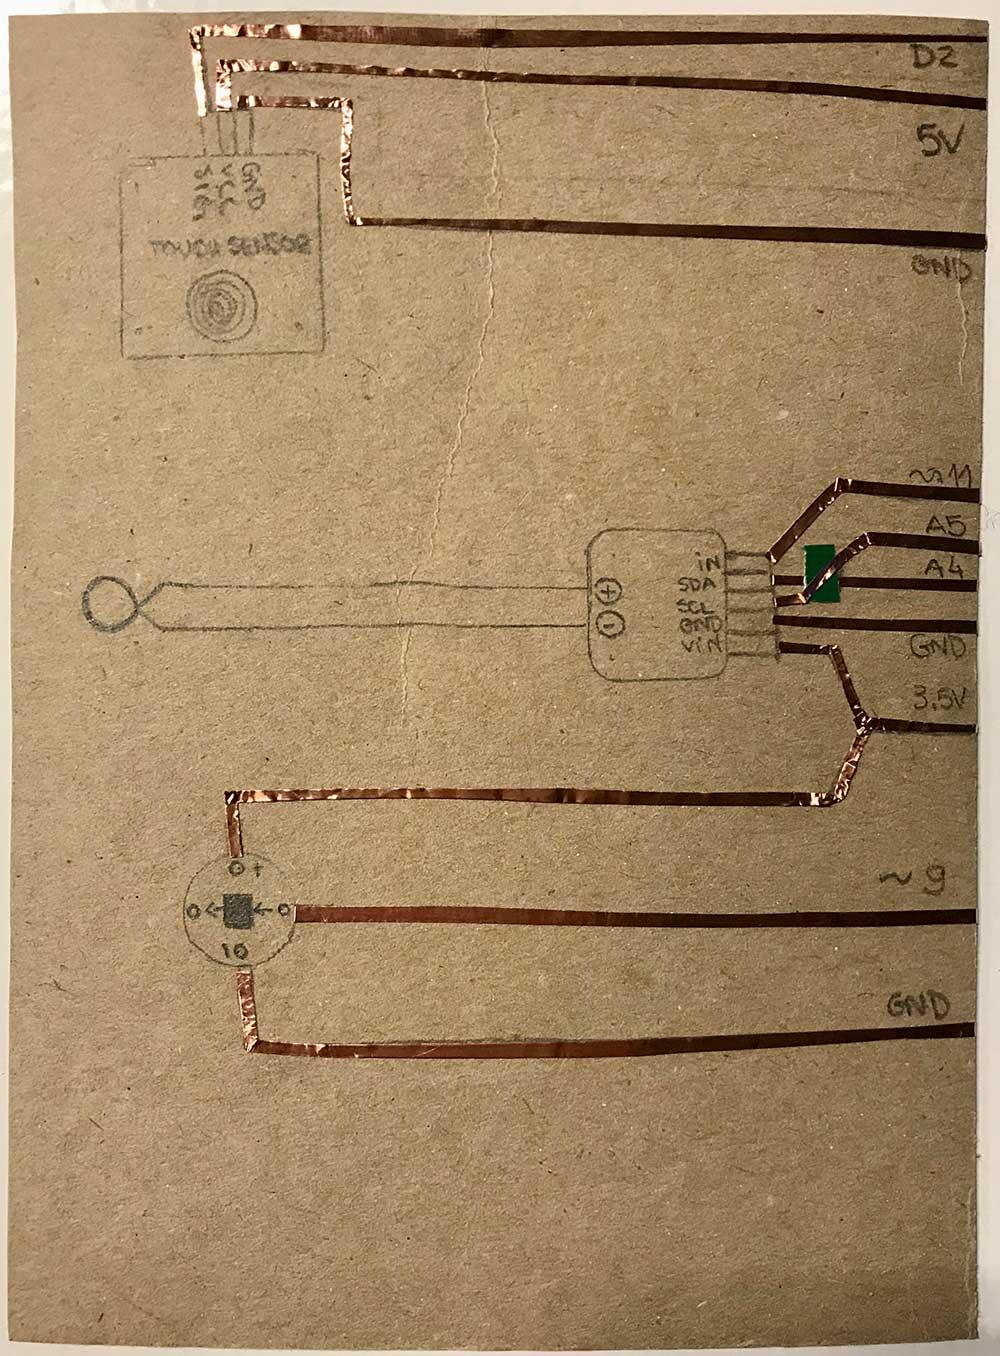 Copper Tape Circuit